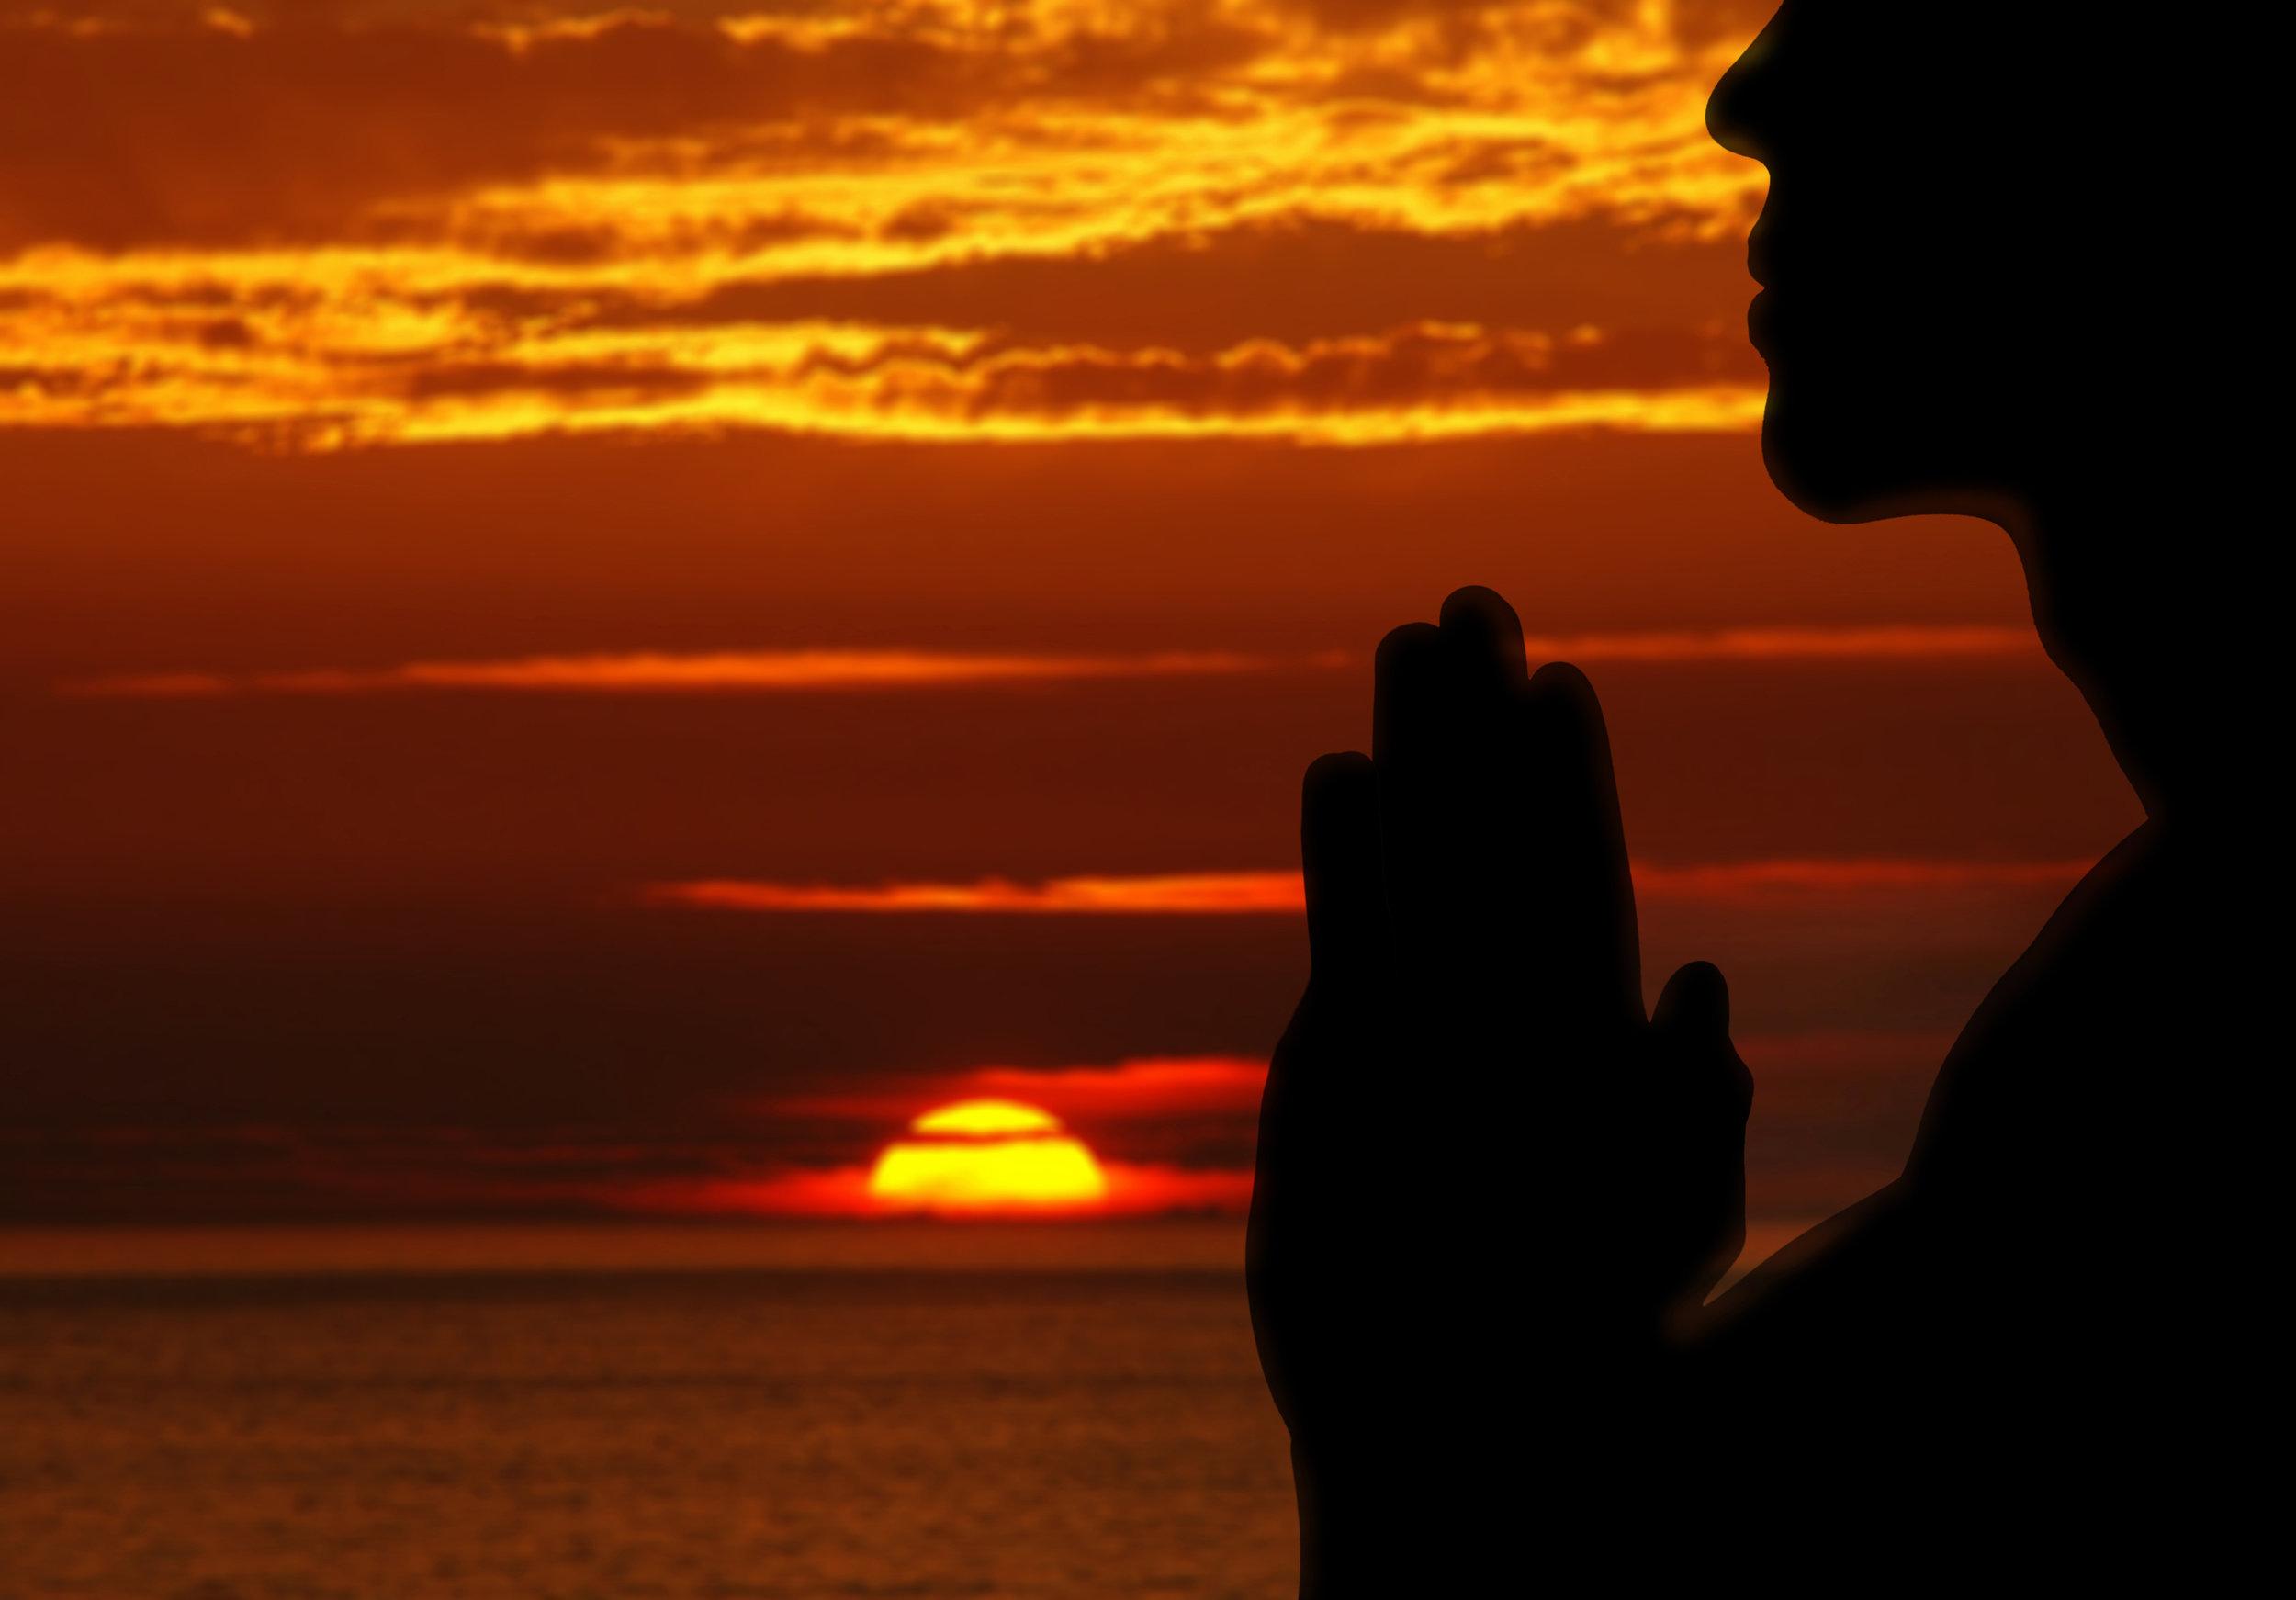 Mindful Moments - Forgiveness & Why It's Key